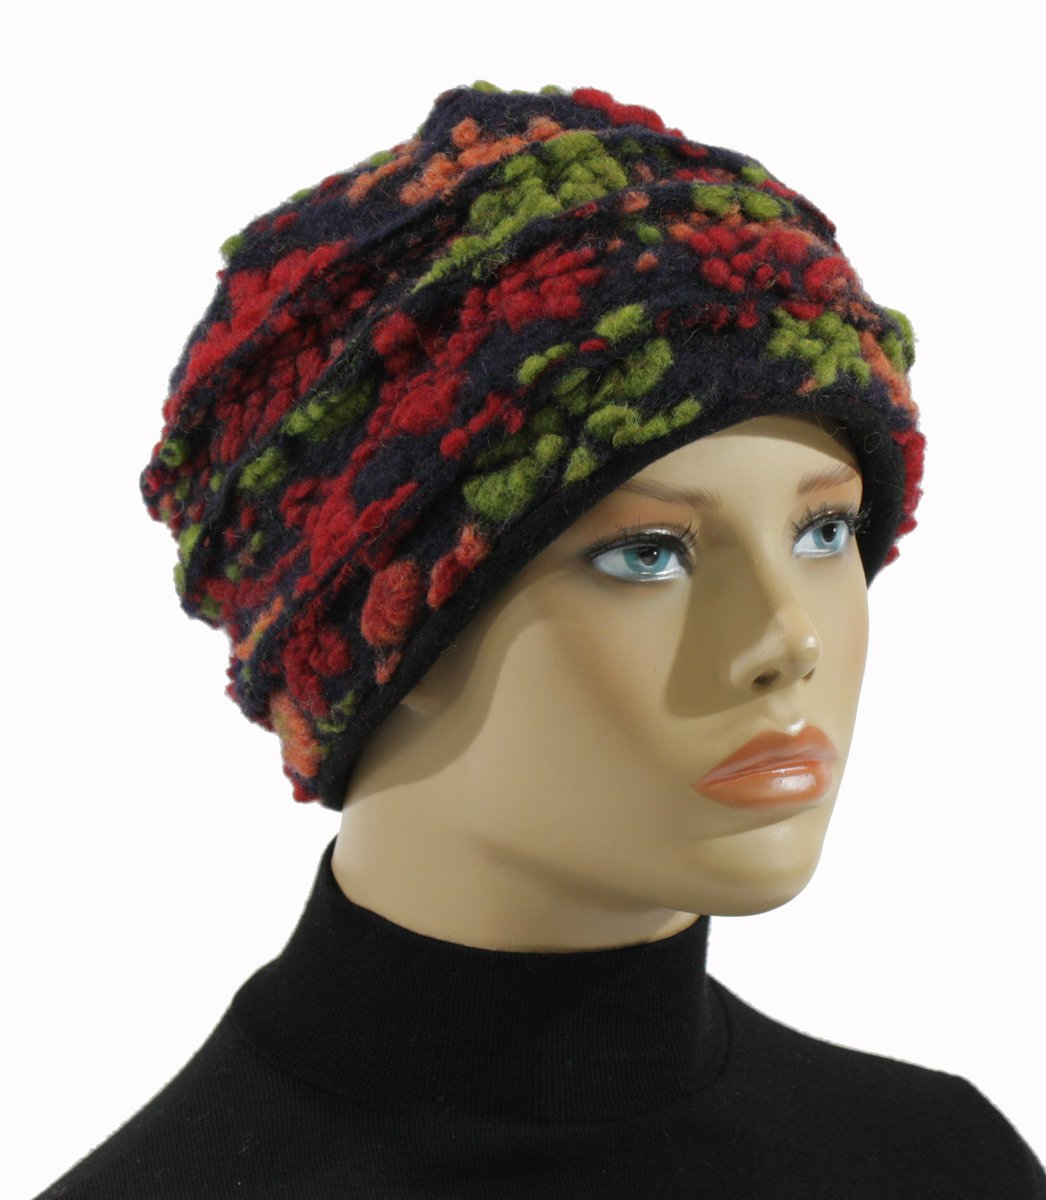 1e8ff0b005d0b3 Wintermützen für kalte Damen Köpfe im Online Shop http://Mode-Atelier- klennes.de pic.twitter.com/gO6HpbXT0L